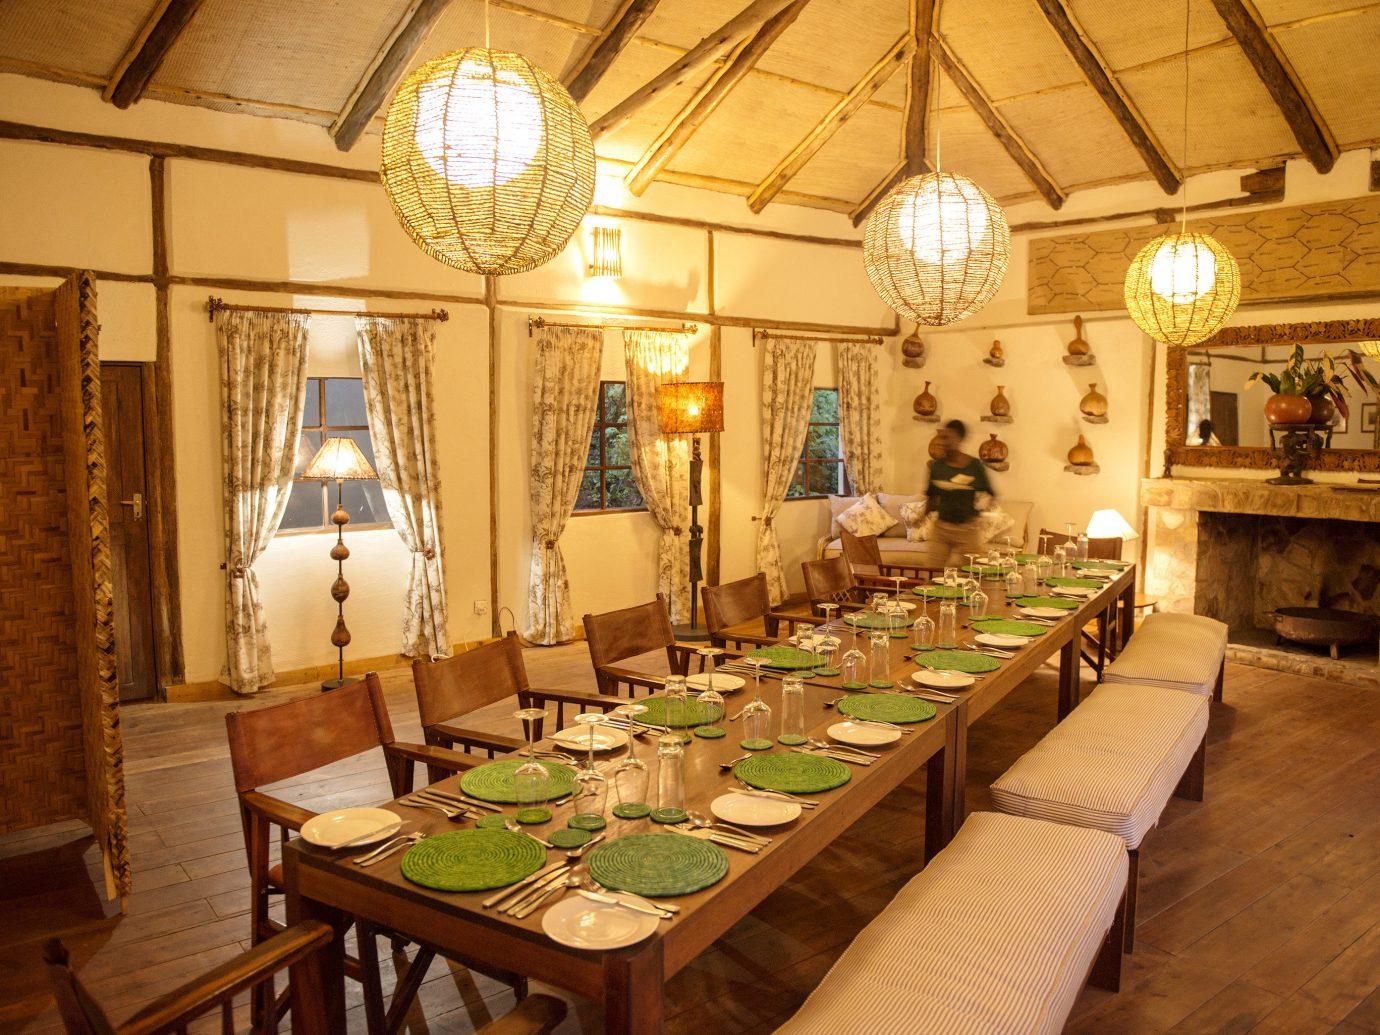 Hotels Outdoors + Adventure indoor table floor room ceiling function hall interior design dining room restaurant estate furniture